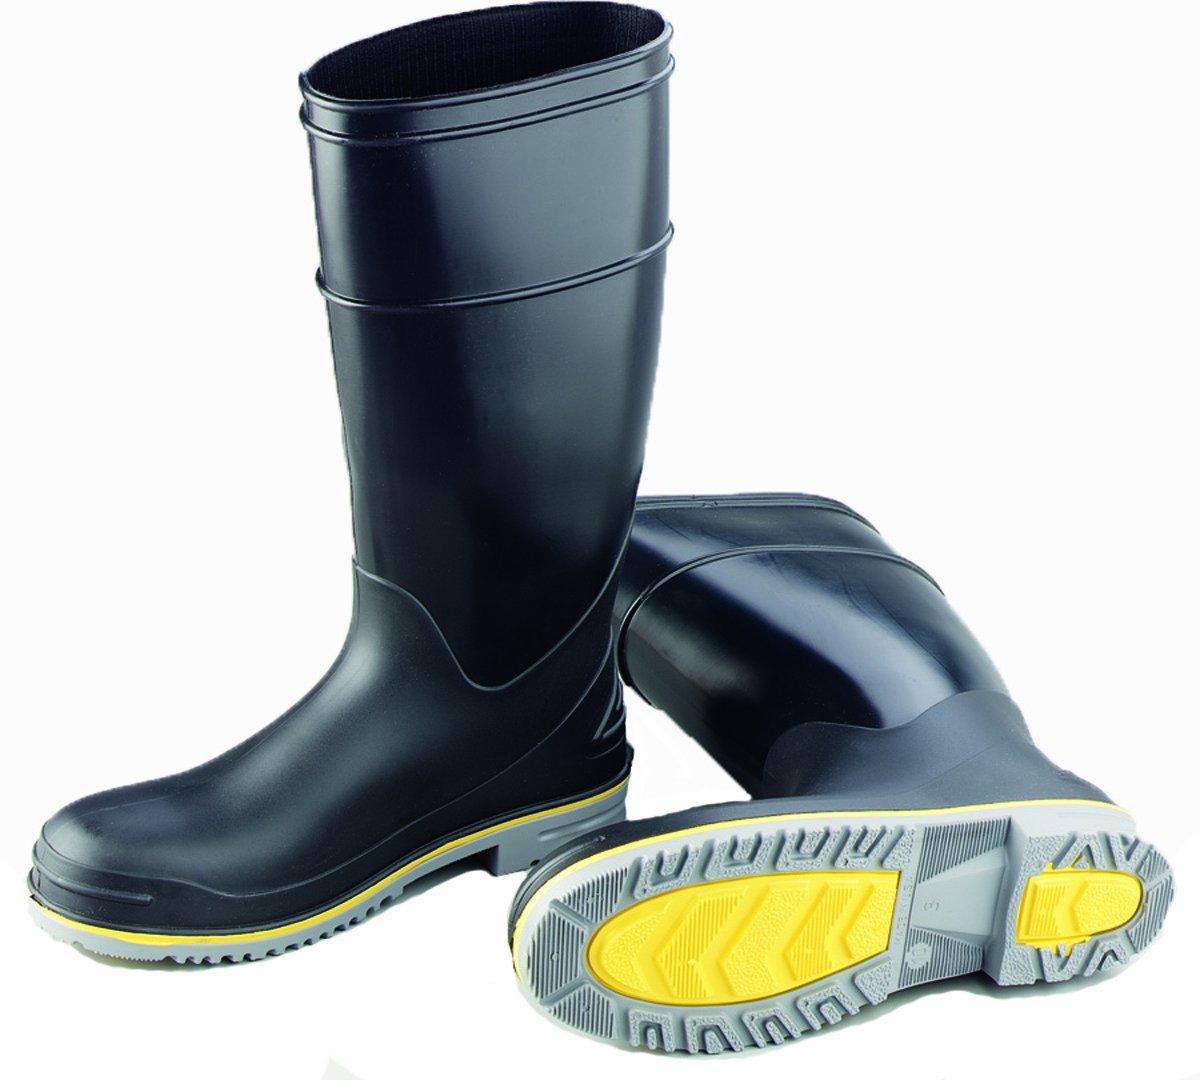 ONGUARD 89904 Polyblend PVC Flex 3 Men's Plain Toe KneeBoots with Power-Lug Outsole, 16'' Height, Size 9